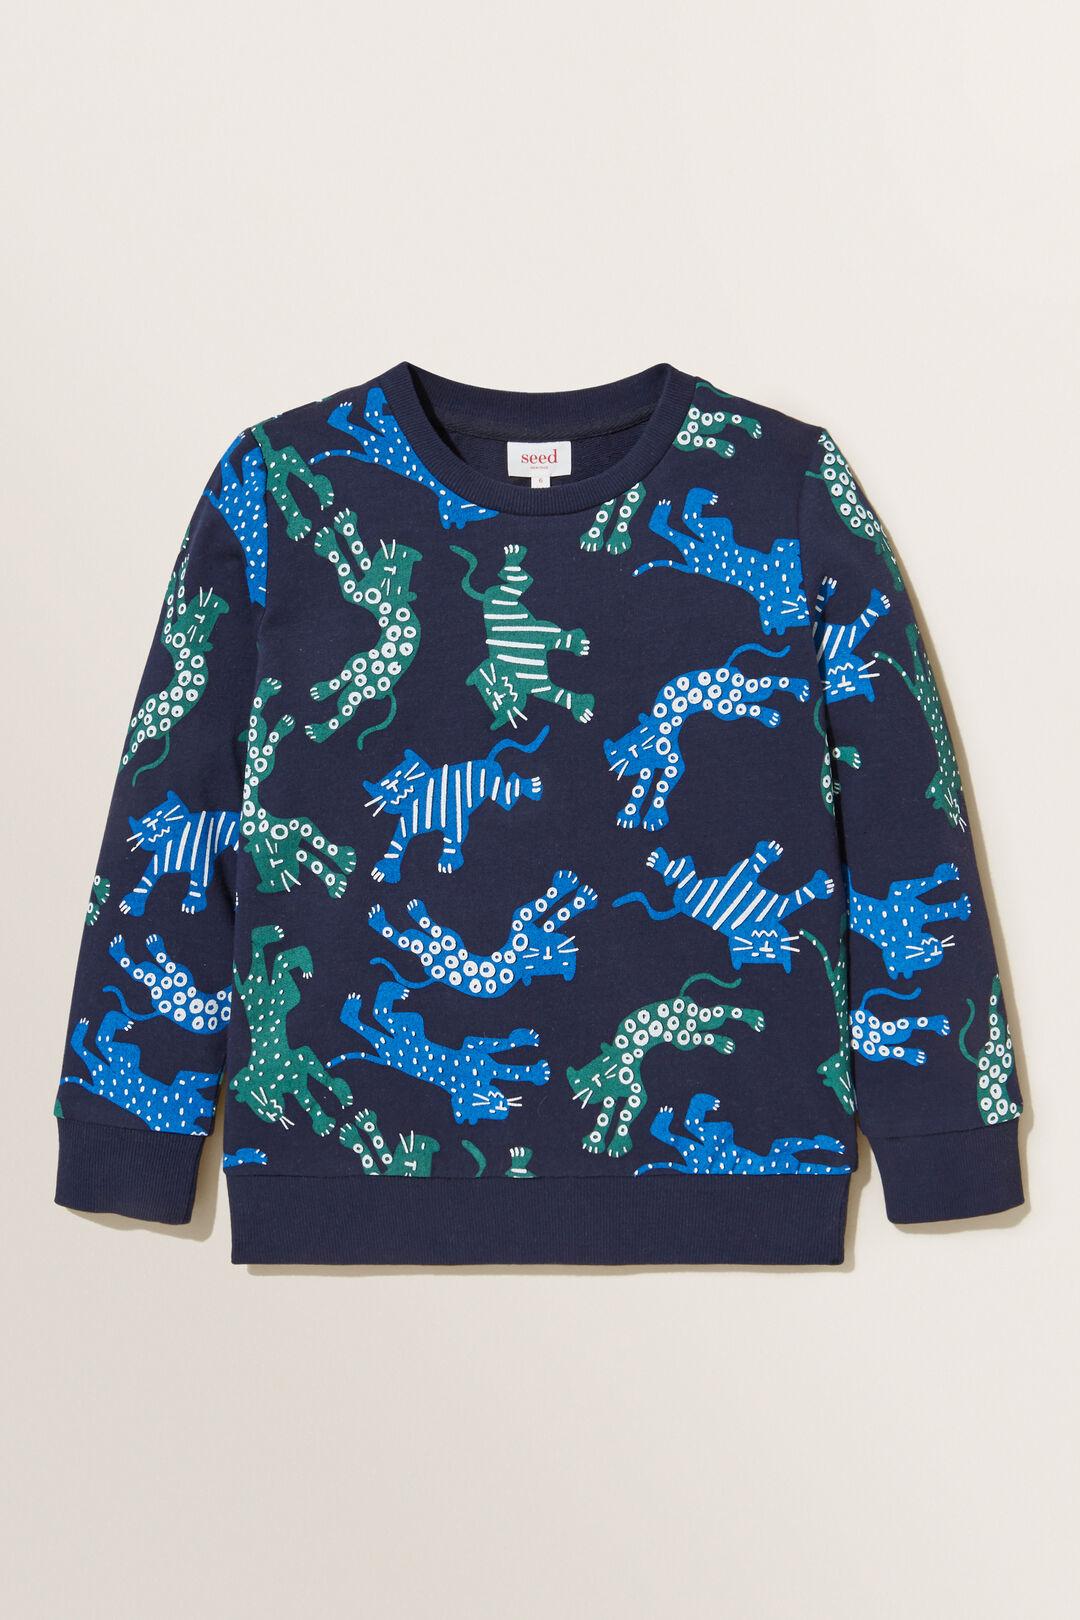 Big Cats  Print  Sweater  MIDNIGHT BLUE  hi-res